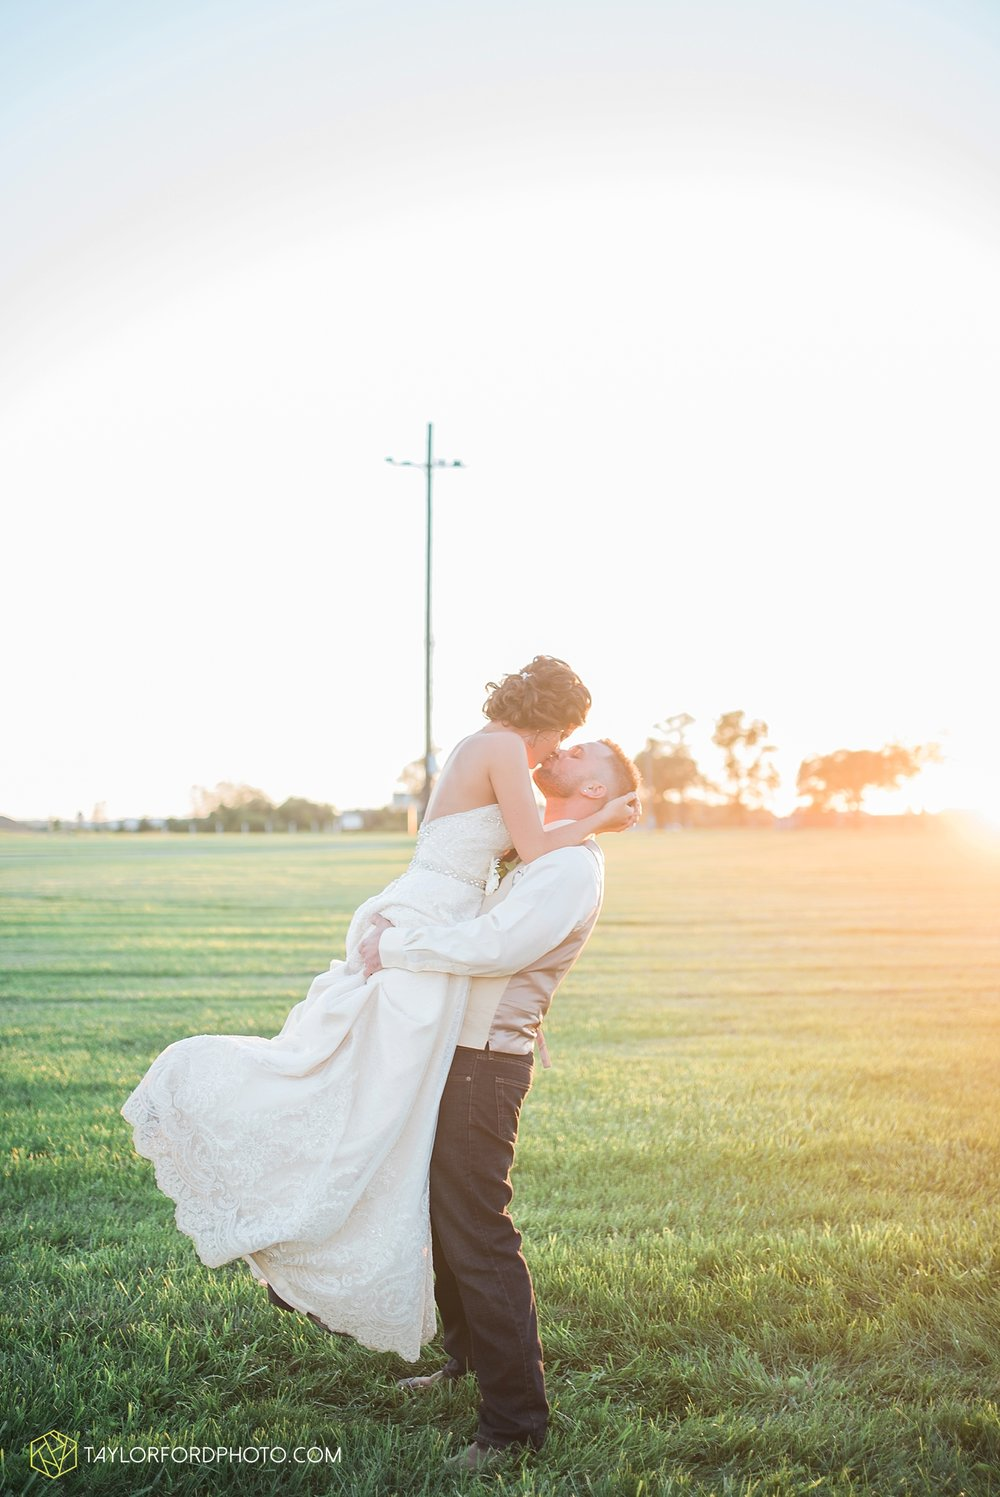 van_wert_ohio_dairy_barn_fairgrounds_fort_wayne_indiana_wedding_photographer_taylor_ford_3332.jpg